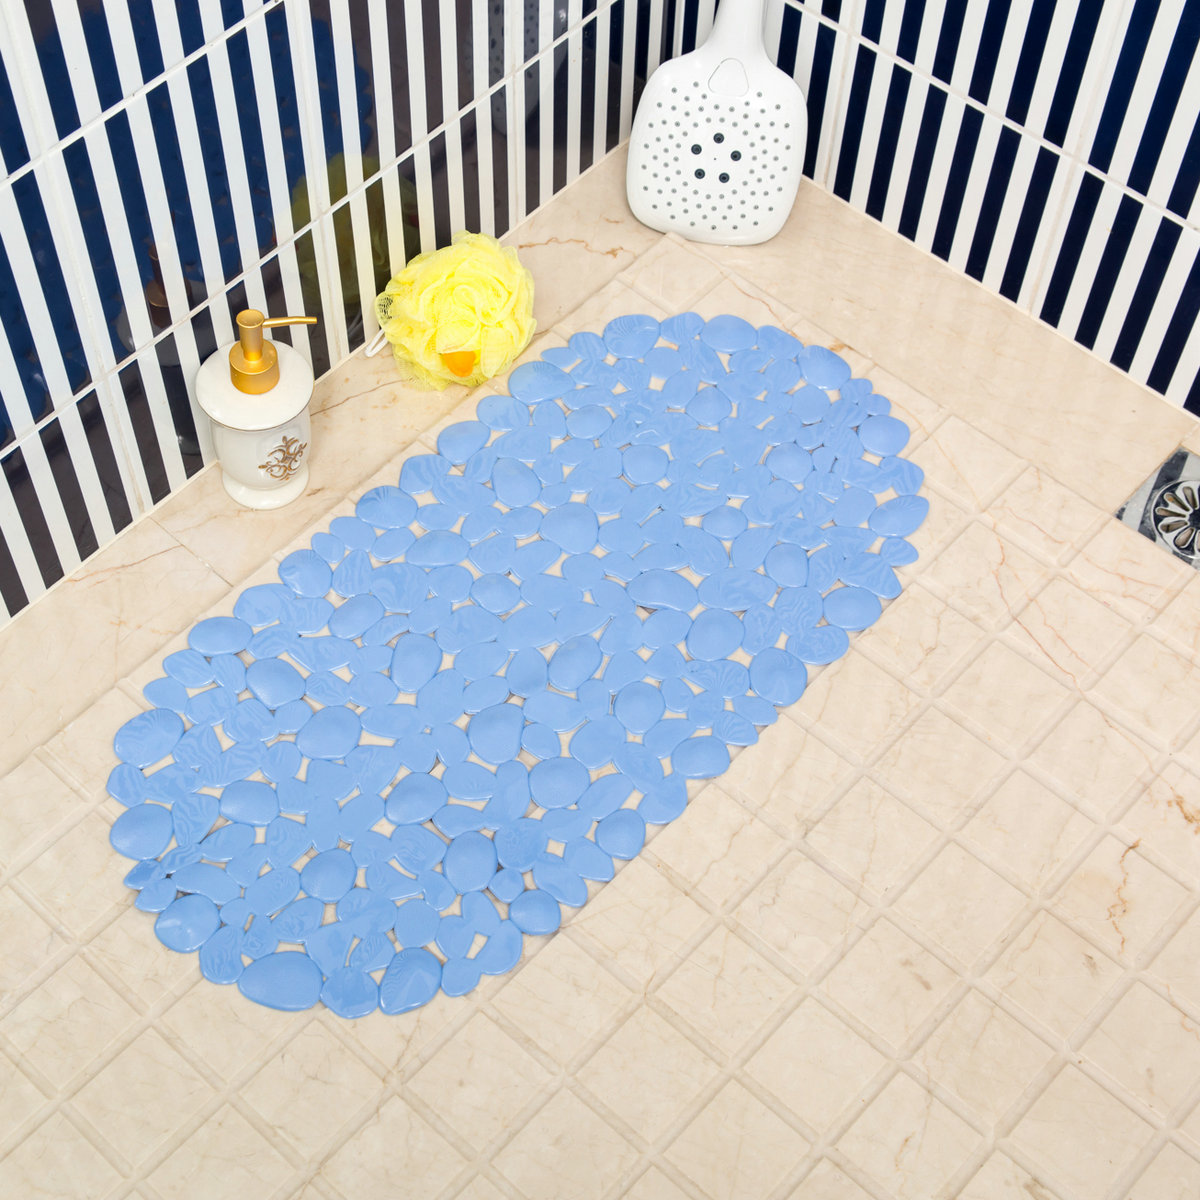 Shower Mats Pebbles Bathroom Bathtub Safety mat Non Slip Rubber ...